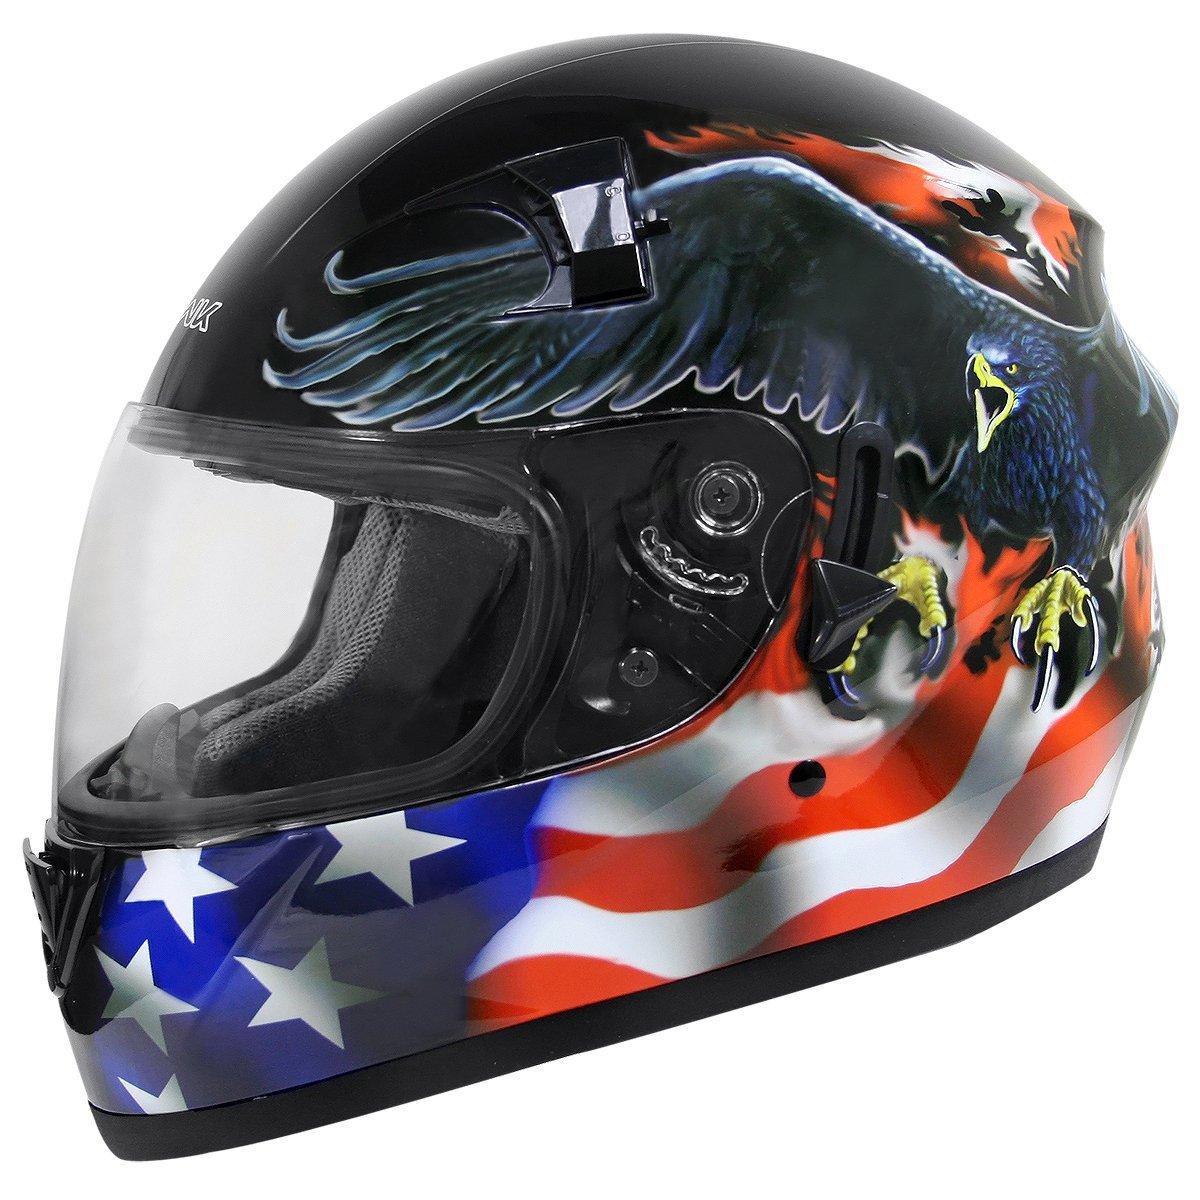 da6813b7 Hawk ST-1150 Glossy Dual Visor Full Face Motorcycle Helmet with U.S. Flag  and E